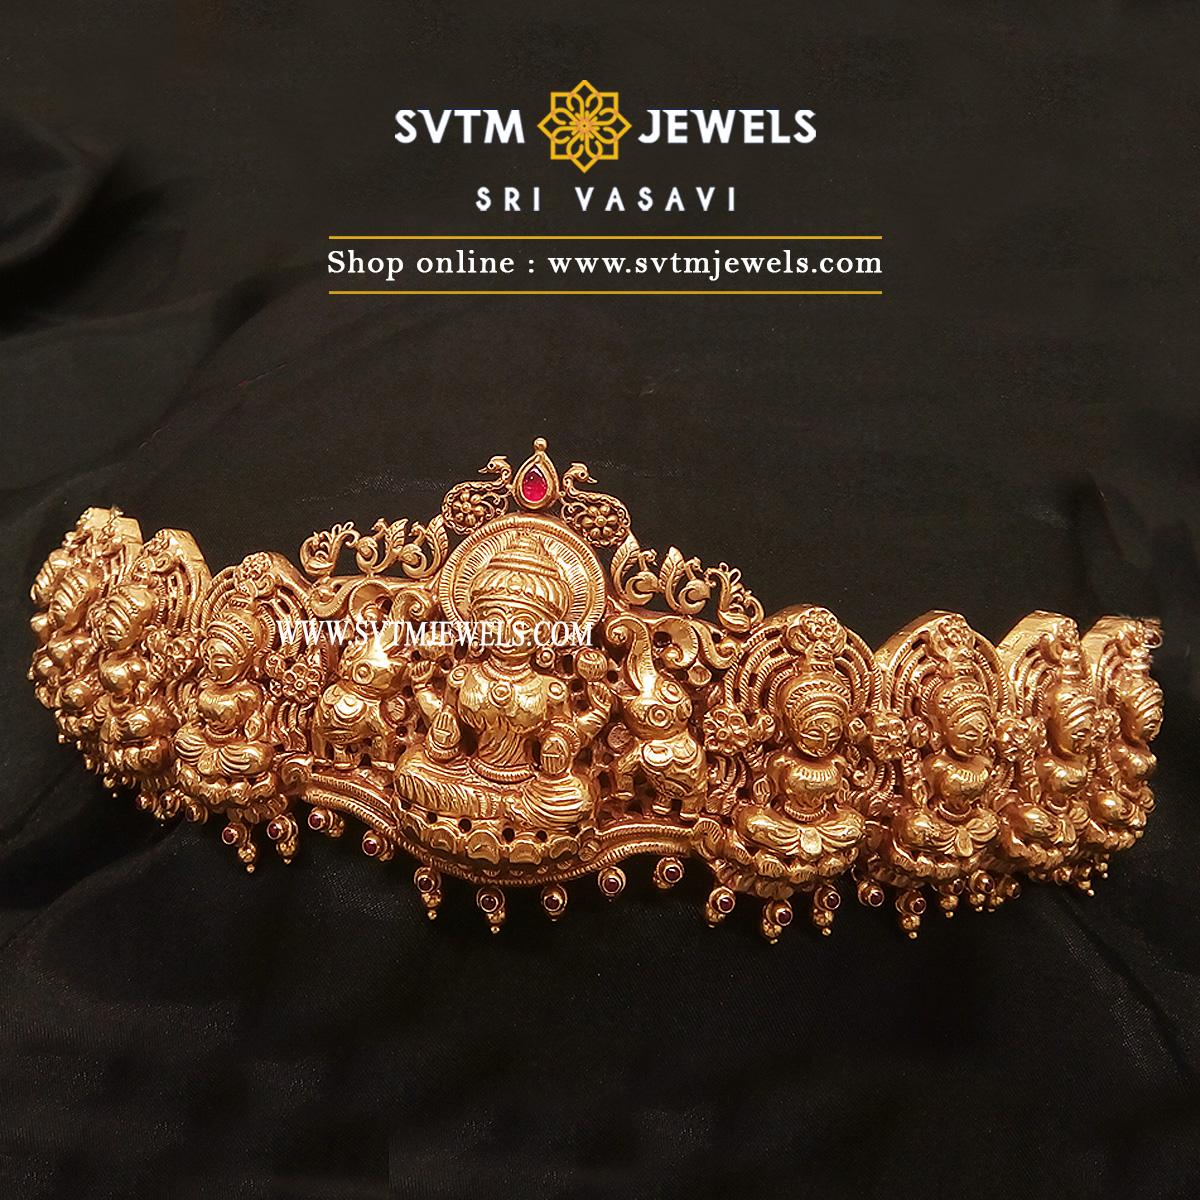 vaddanam-ottiyanam-hip-belt-designs (11)